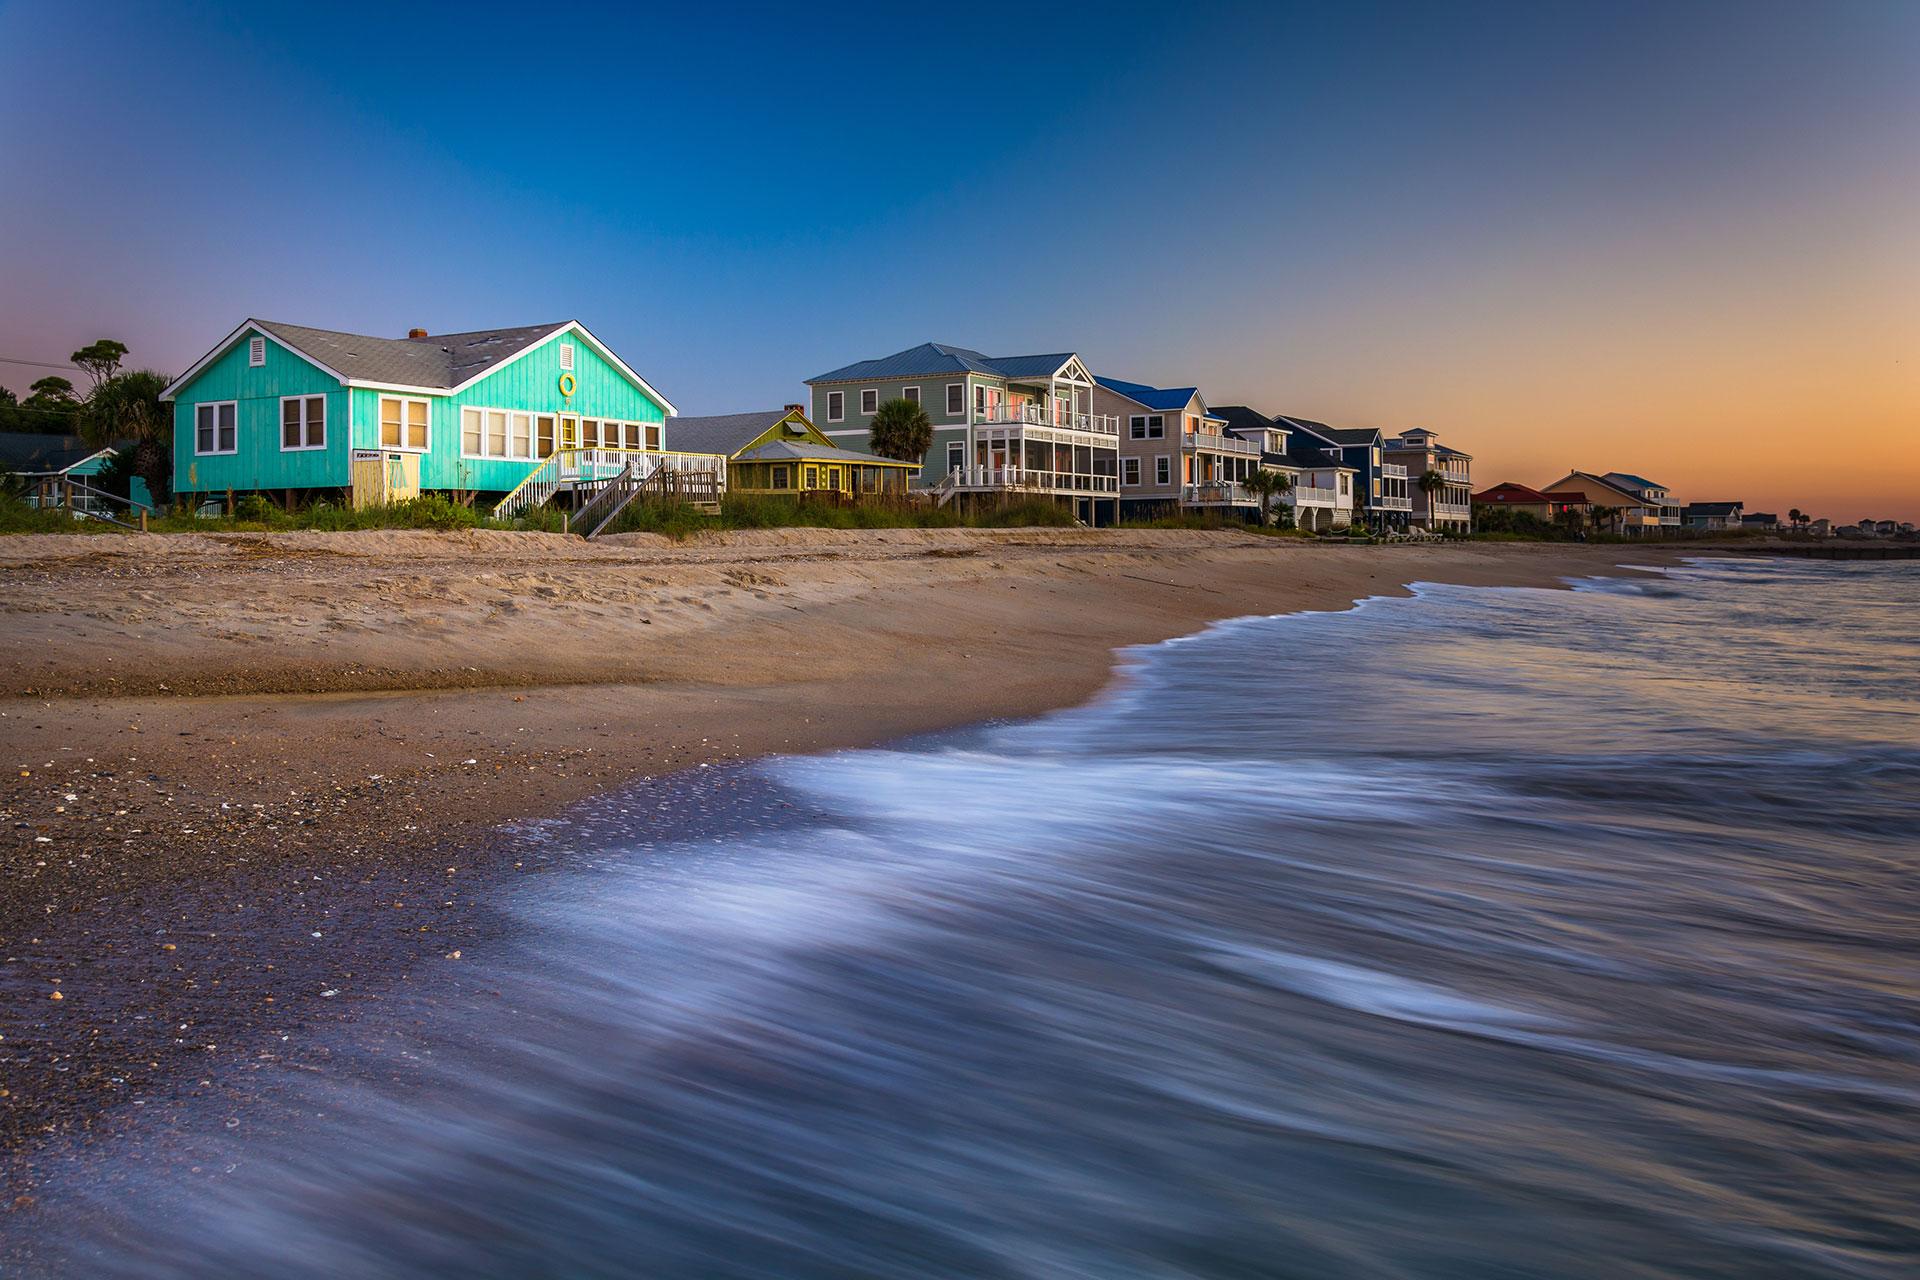 Edisto Island, South Carolina; Courtesy of John Bilous/Shutterstock.com